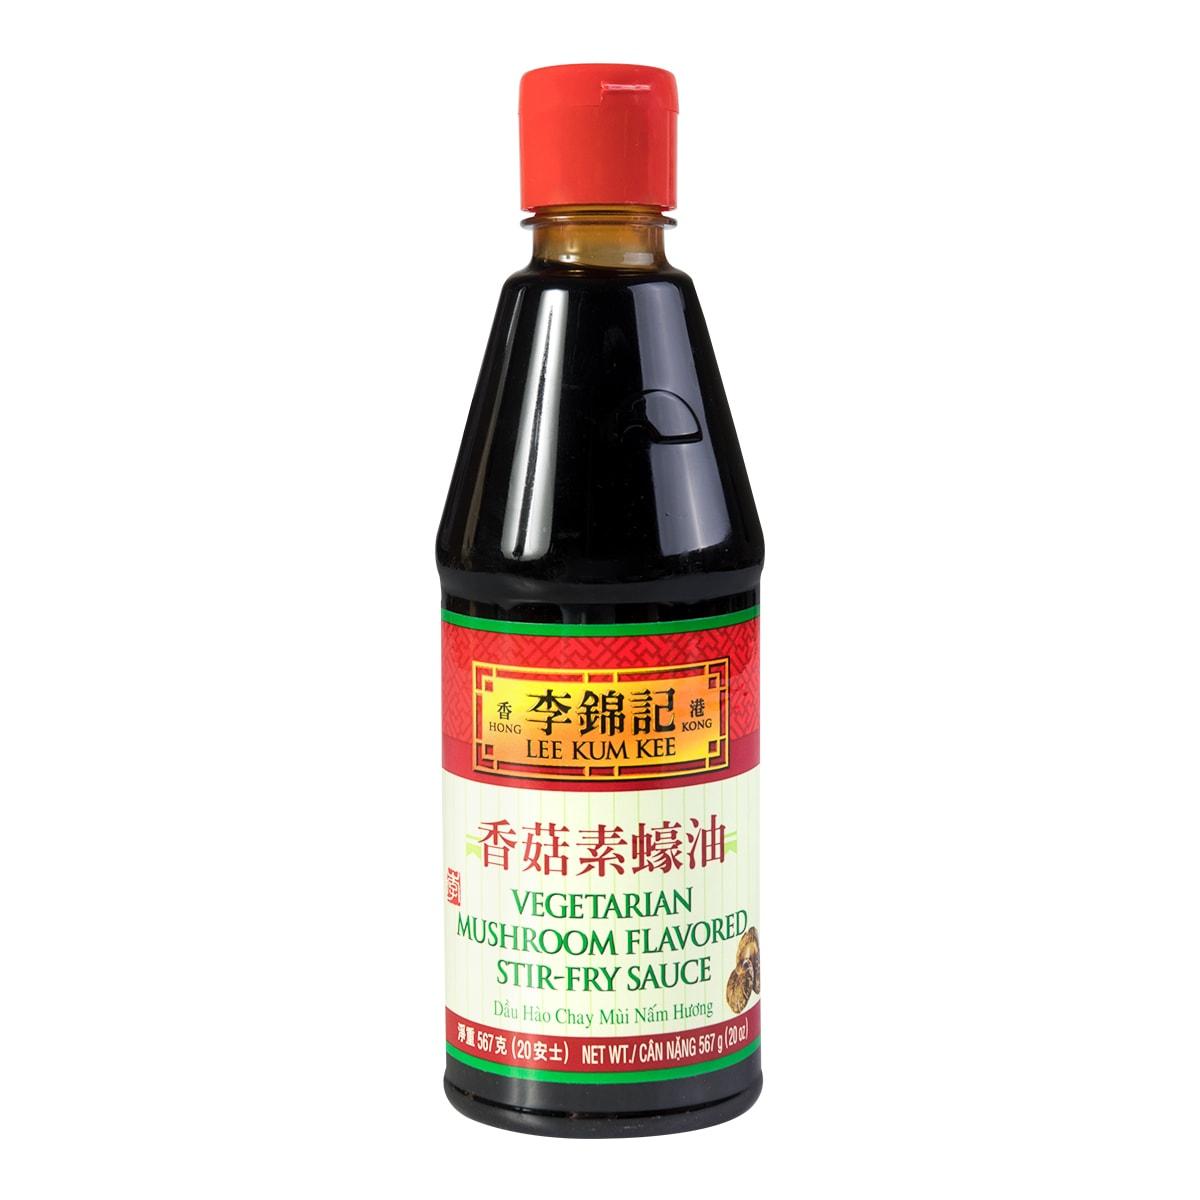 LEE KUM KEE Stir‑Fry Sauce Vegetarian Mushroom Flavored Sauce 567g